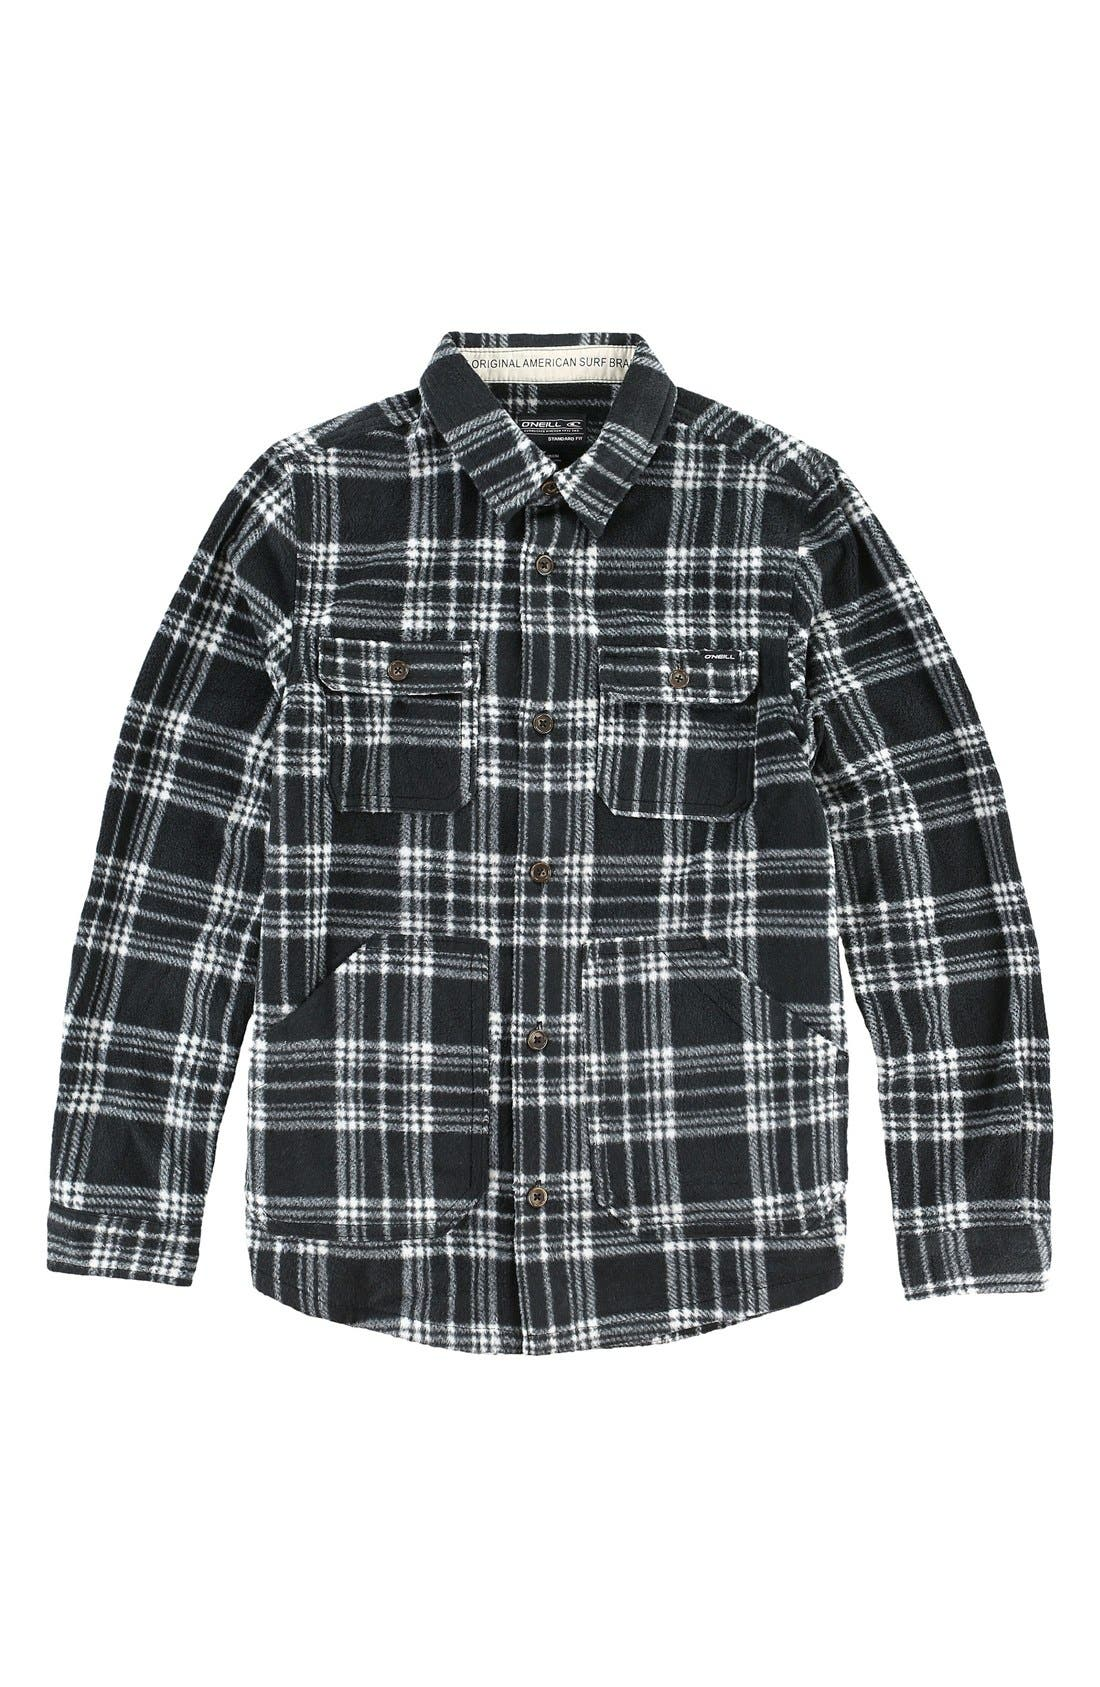 'Glacier' Check Long Sleeve Fleece Shirt,                         Main,                         color, 001